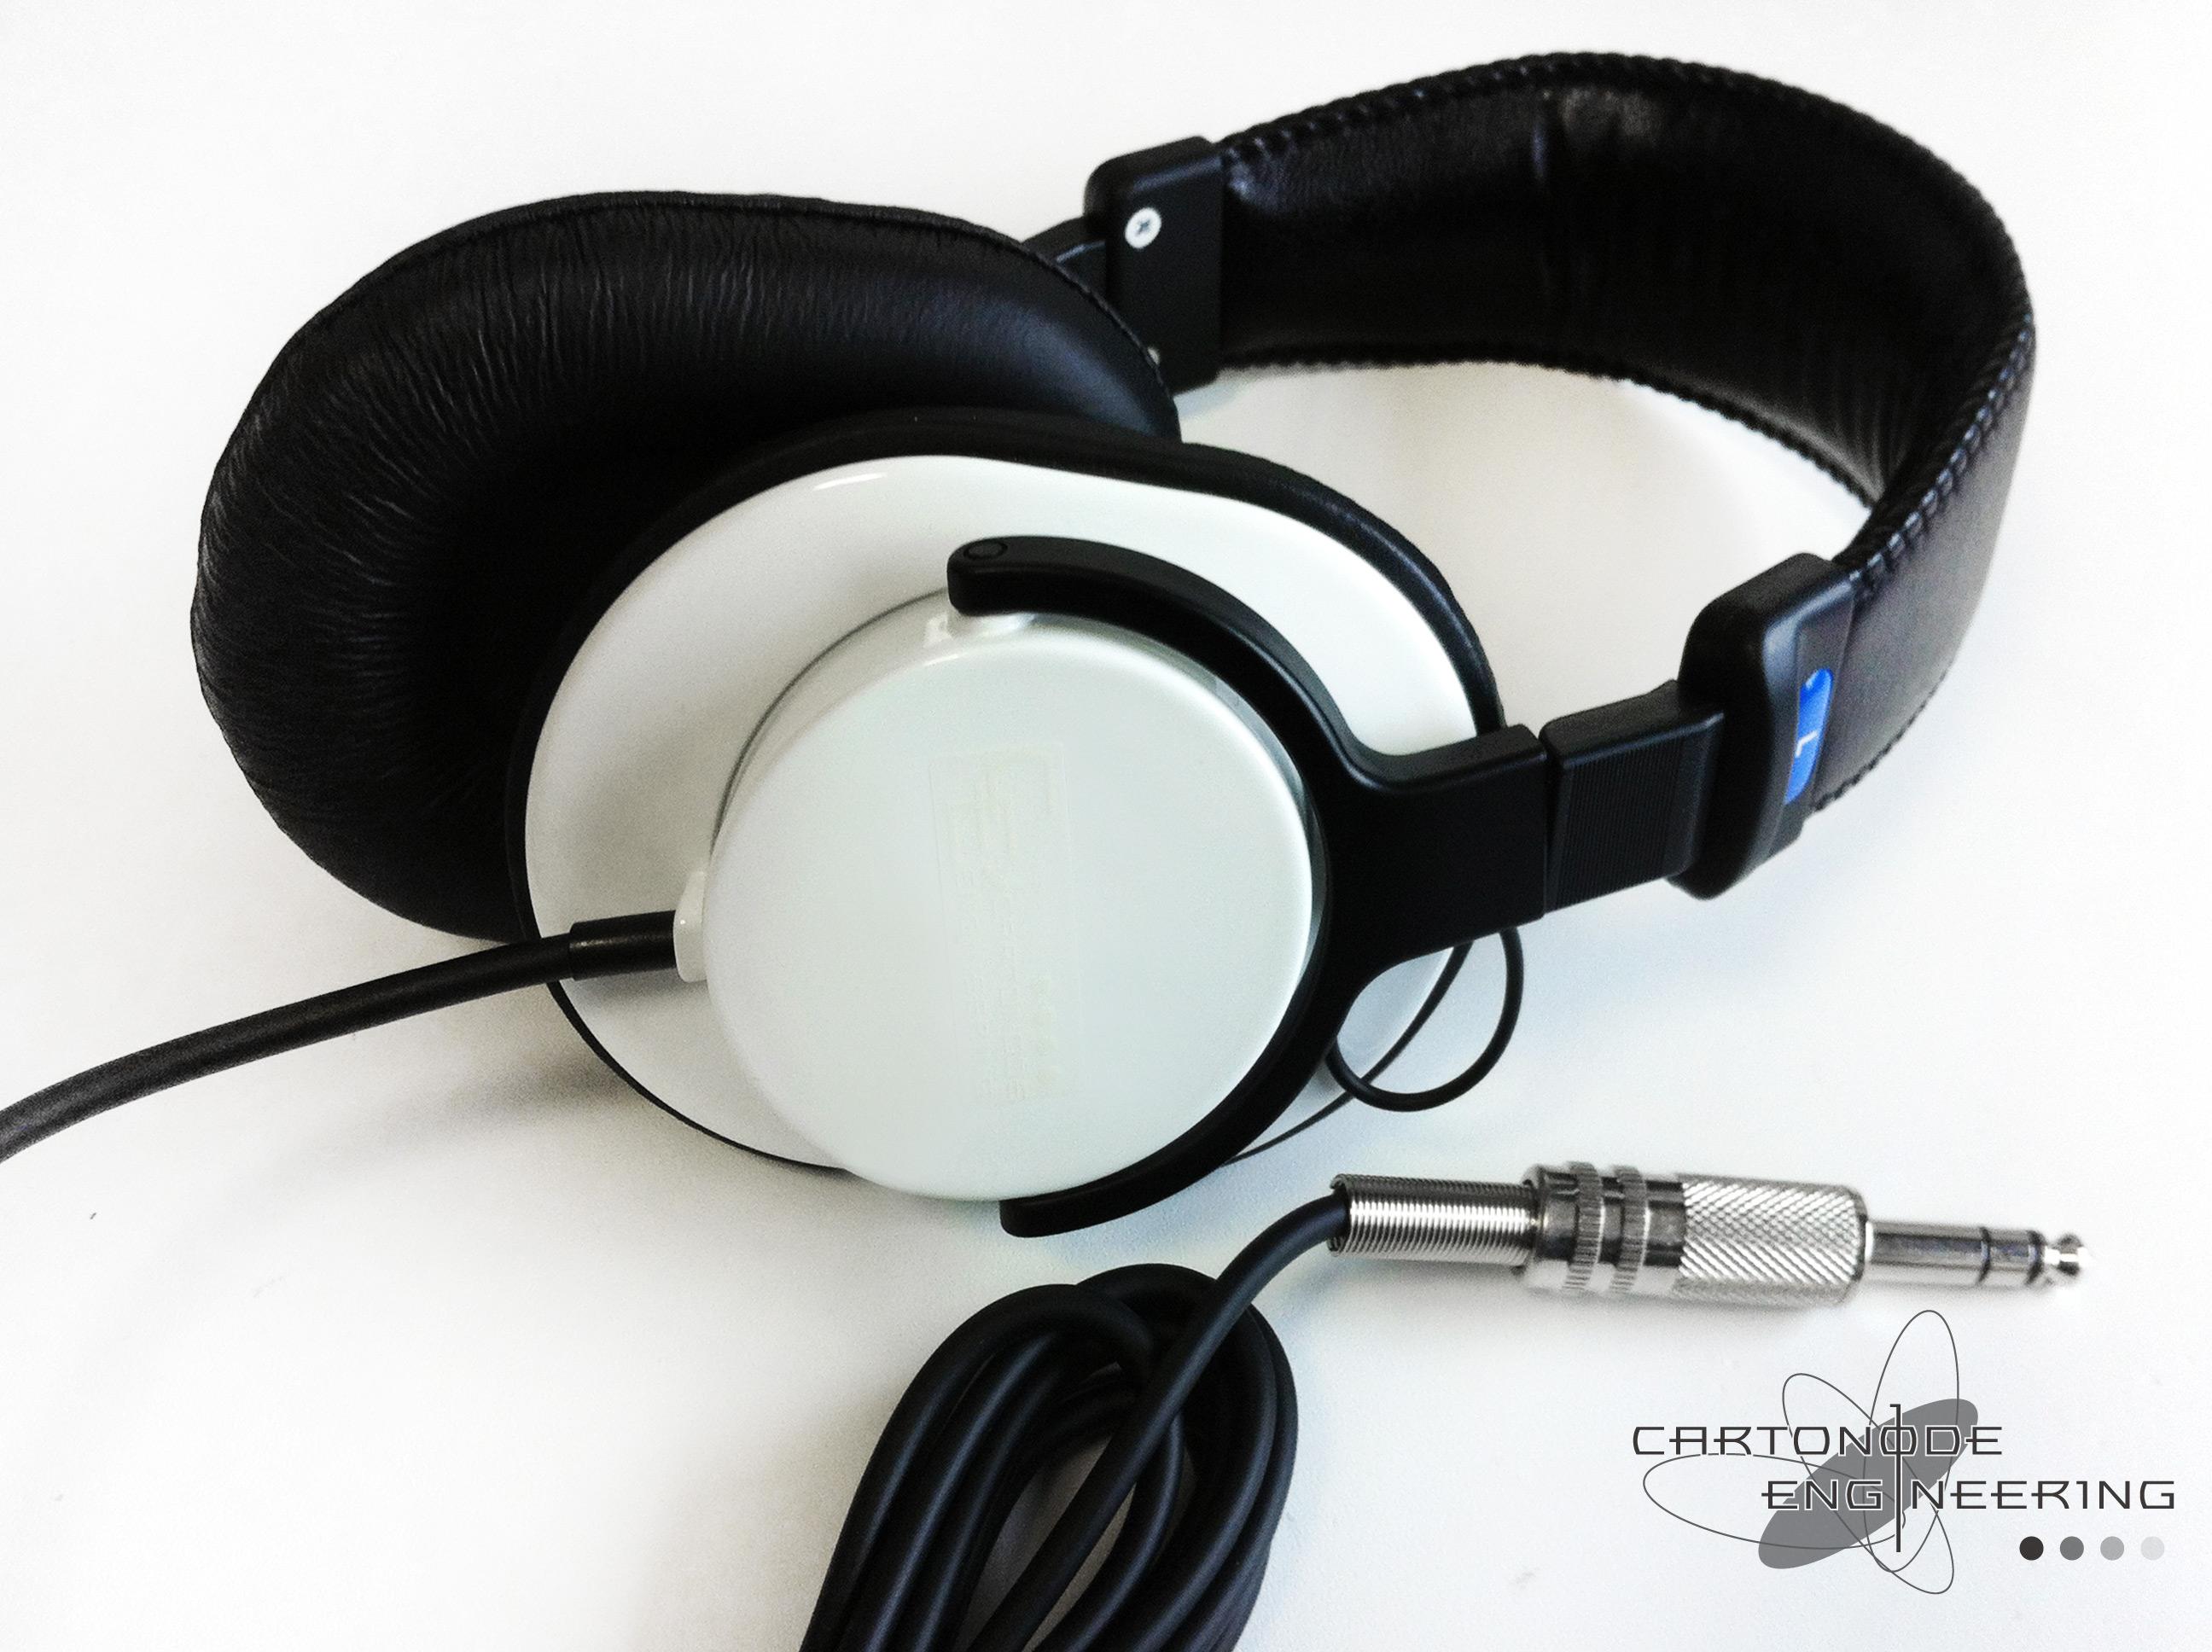 MDR-CD900ST-CETDNT-POLAR_5